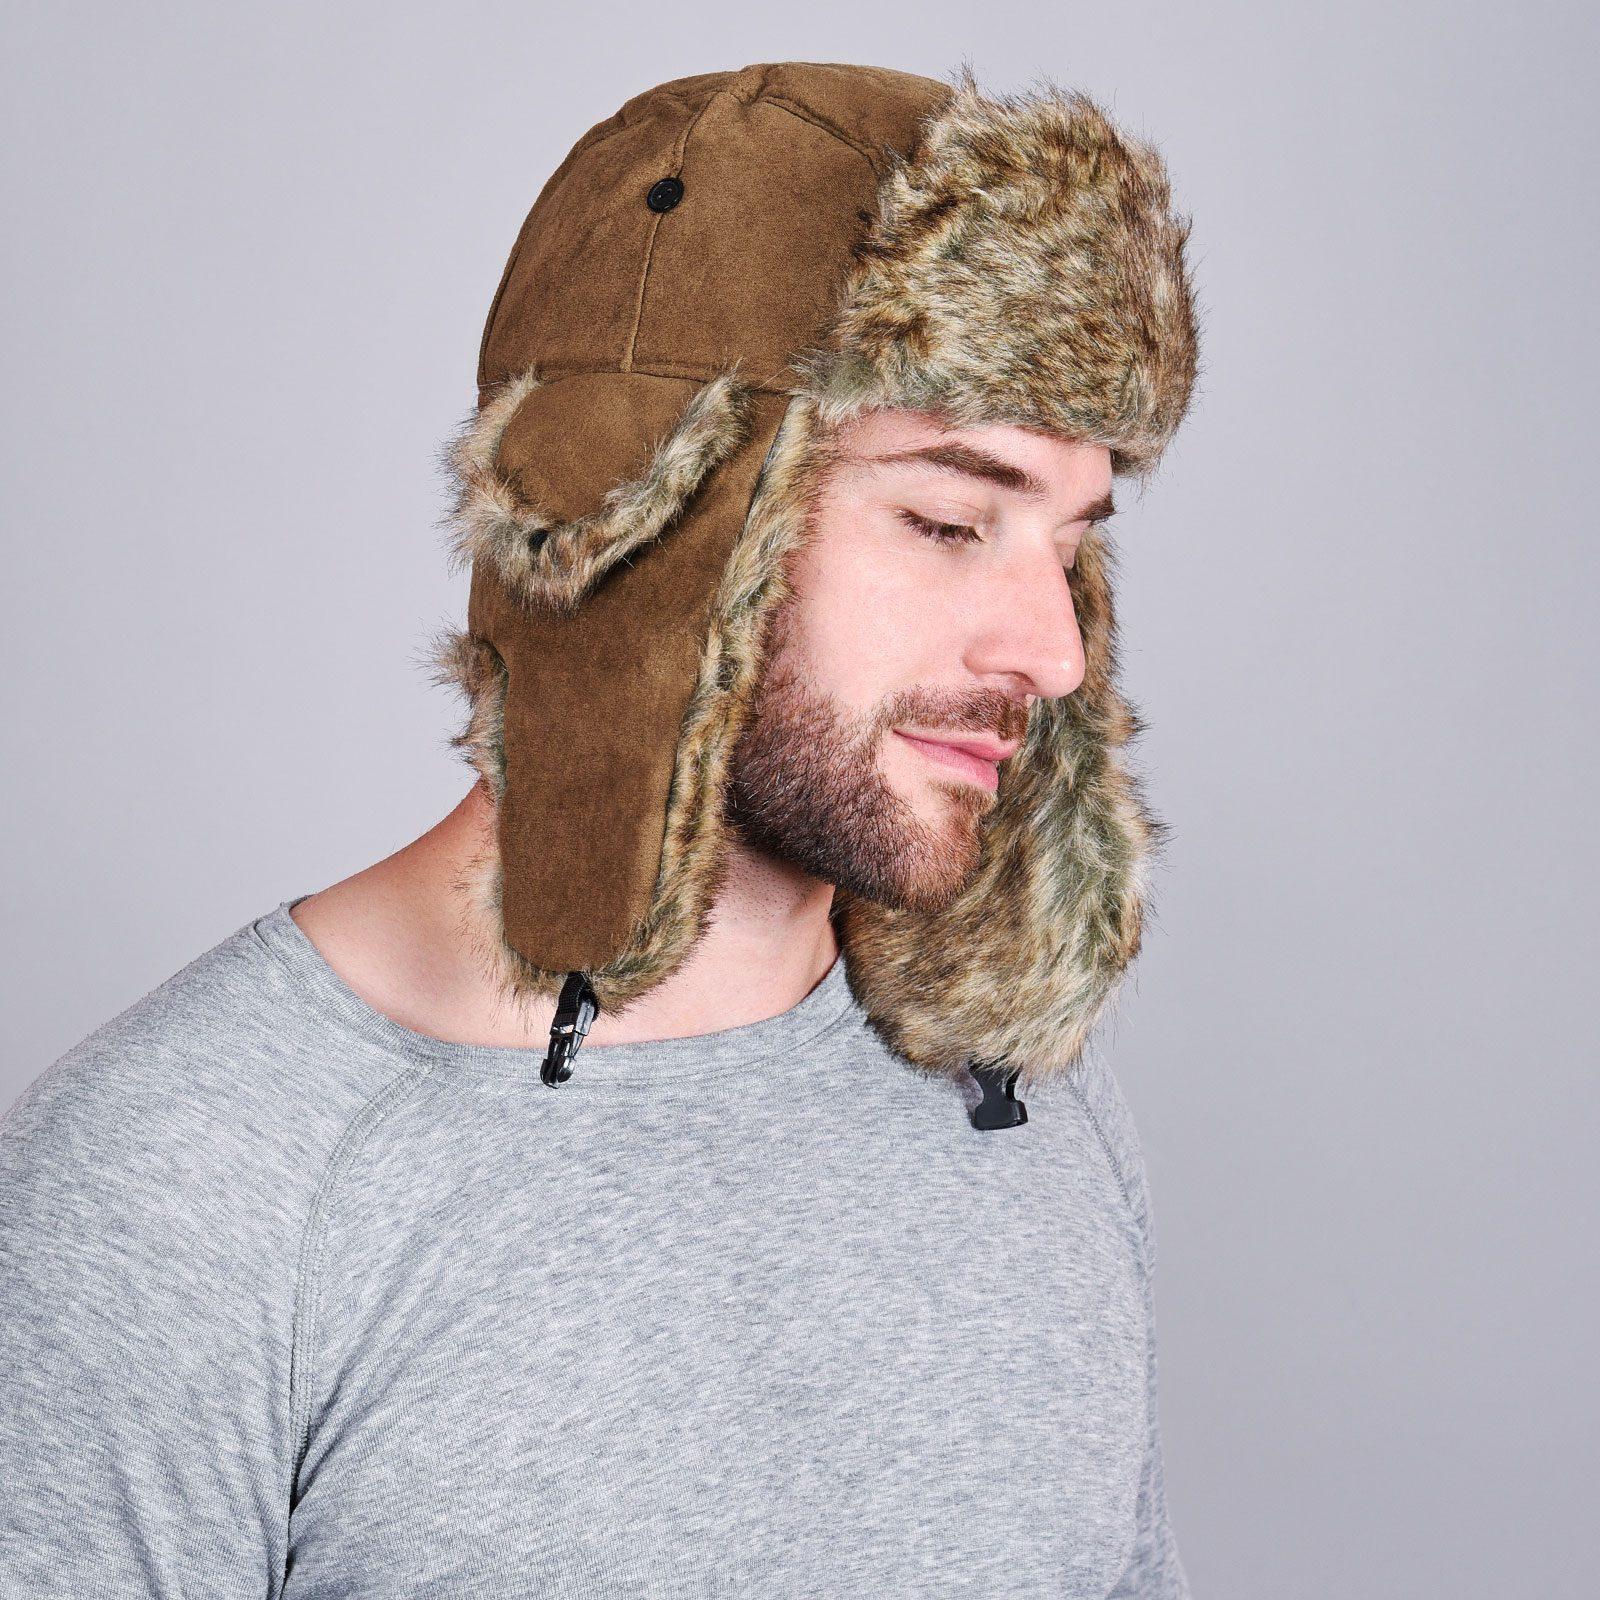 http://lookbook.allee-du-foulard.fr/wp-content/uploads/2018/11/CP-00146-VH16-1-chapka-homme-camel-1600x1600.jpg